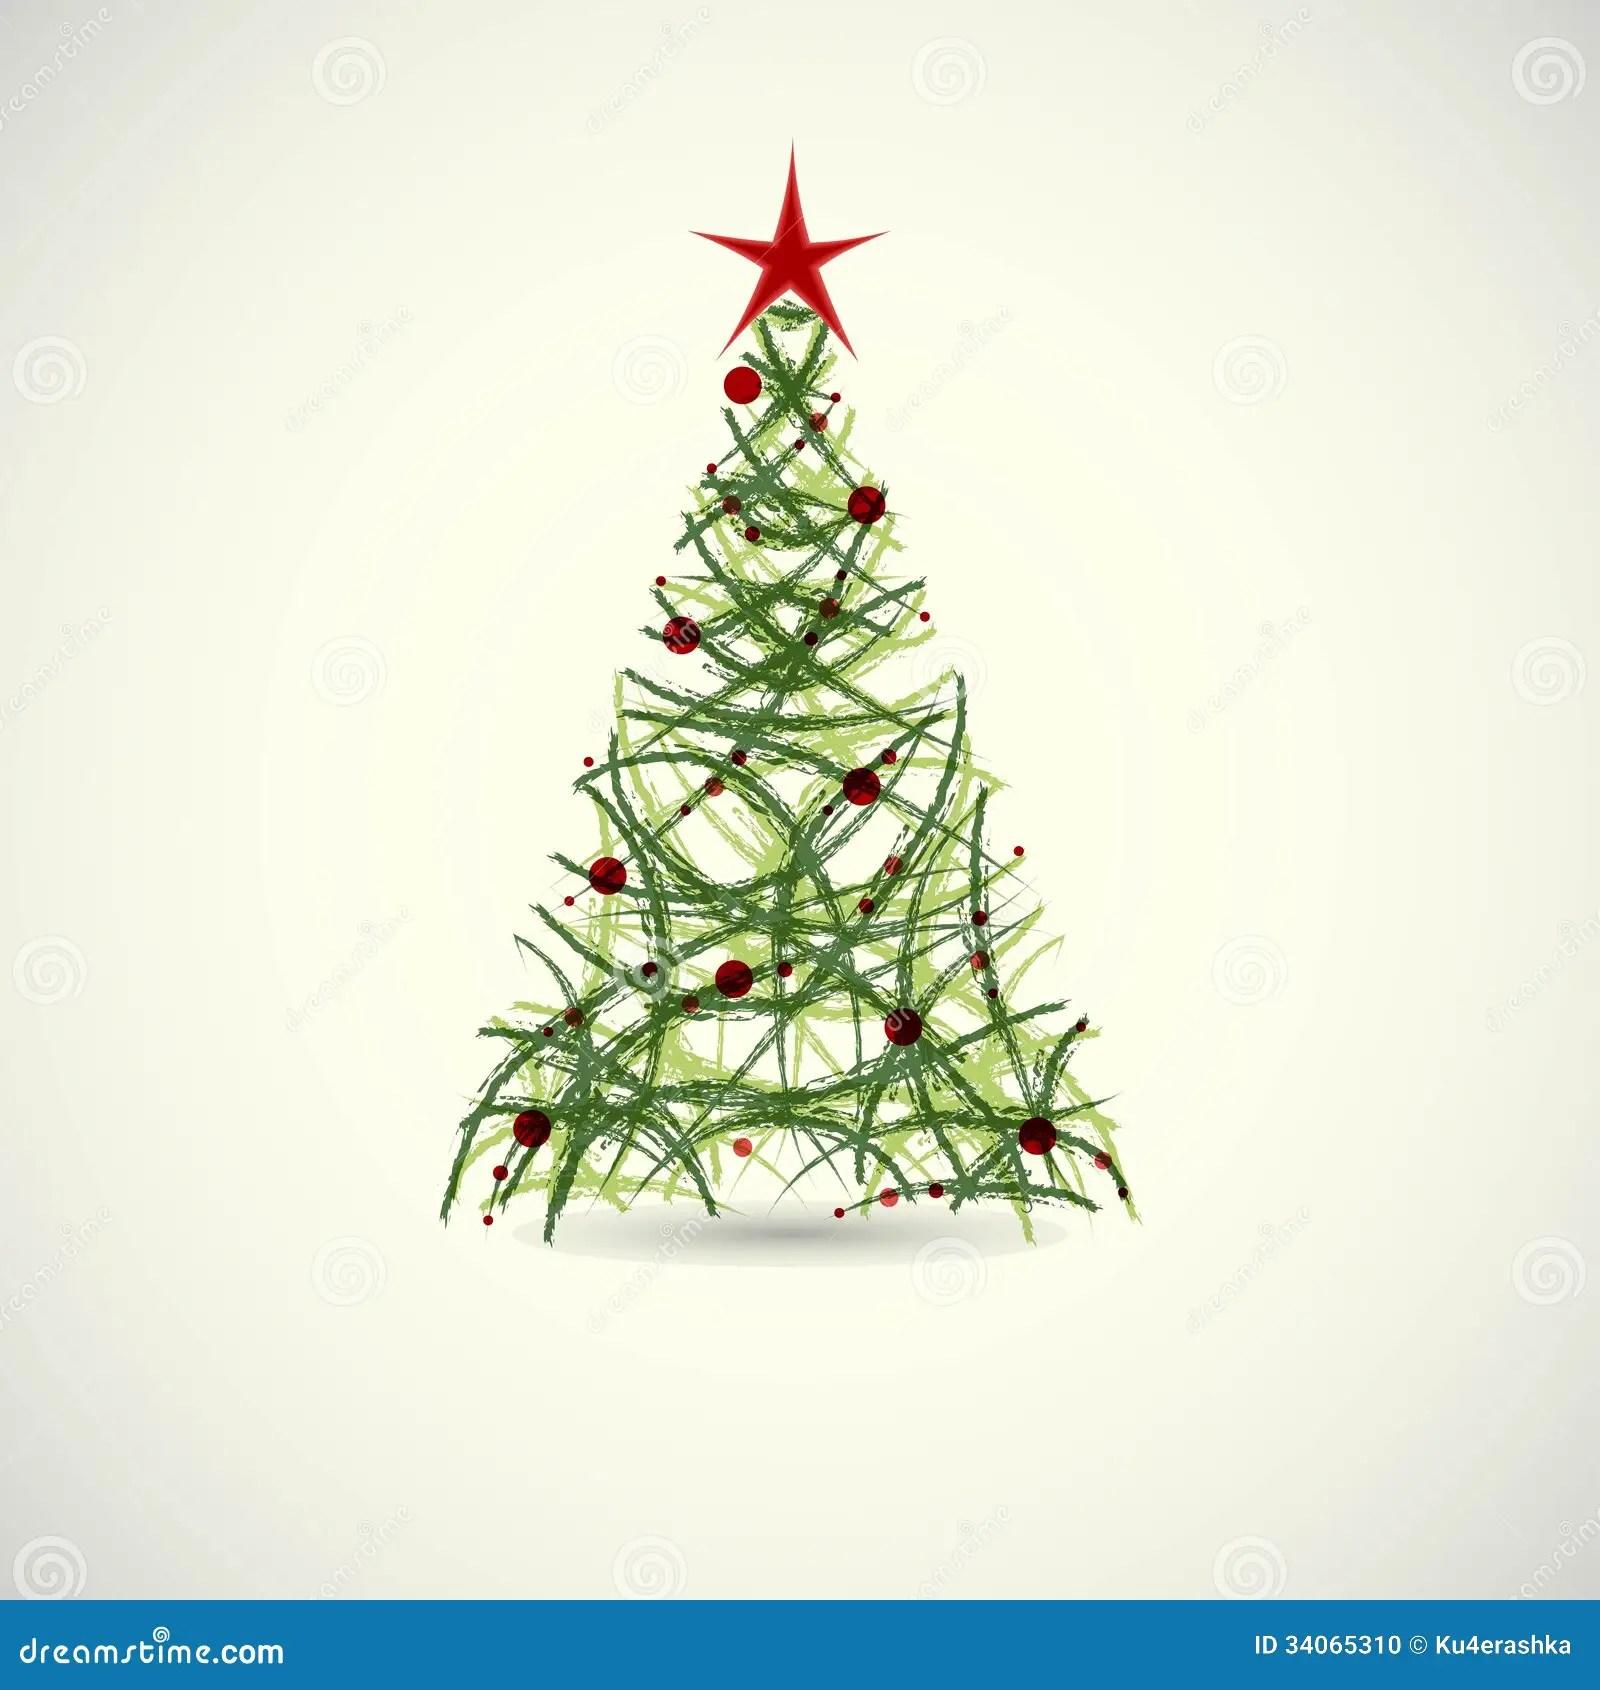 Abstract Green Christmas Tree Vector Stock Vector Image